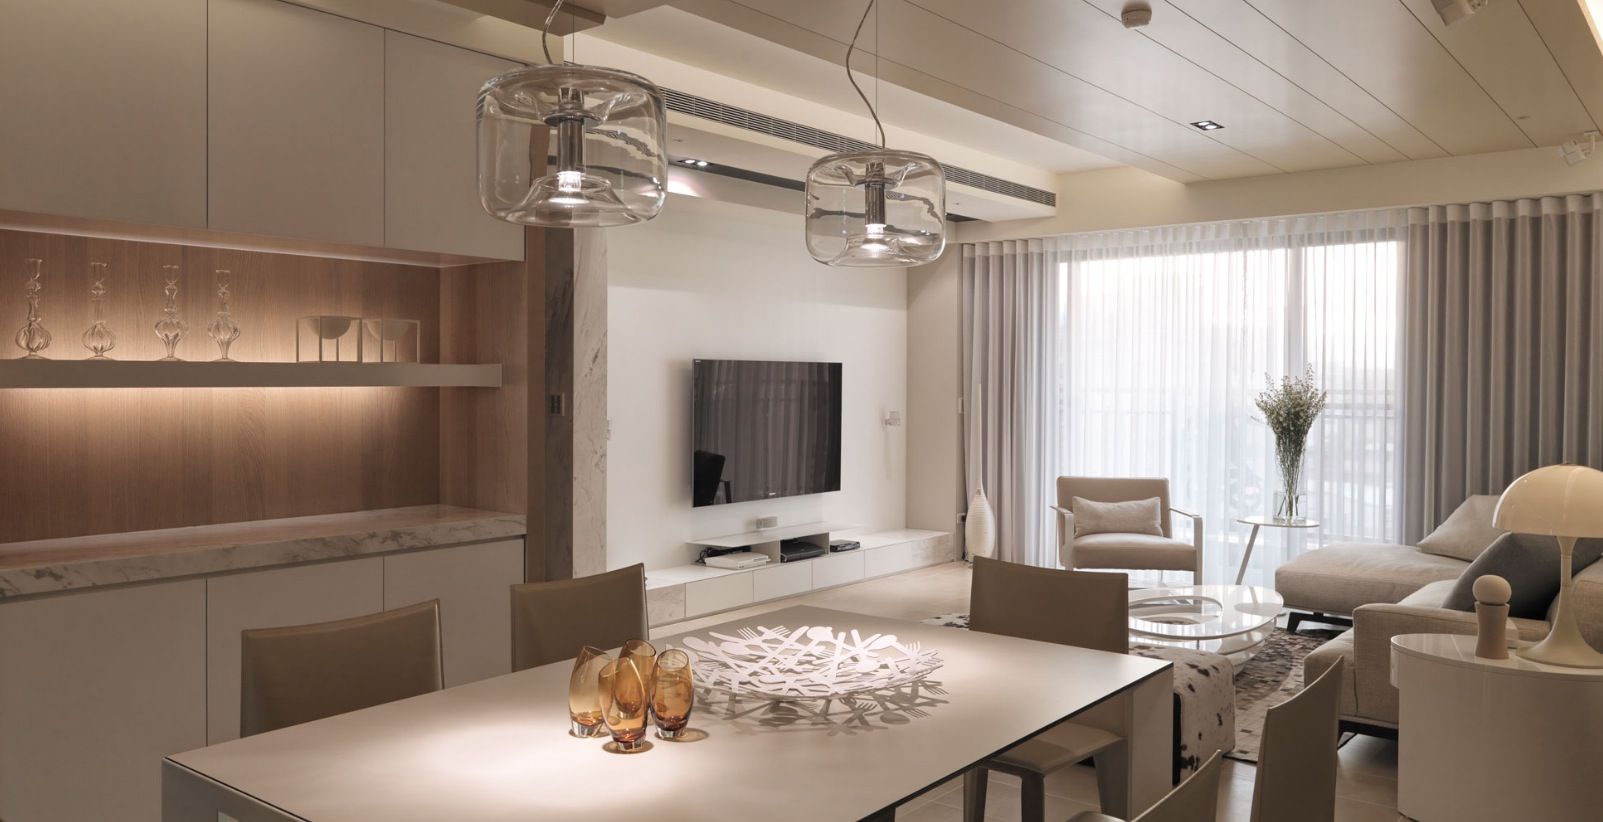 Mini appartamenti 5 soluzioni sorprendenti dai 40 ai 50 for Arredamenti case bellissime